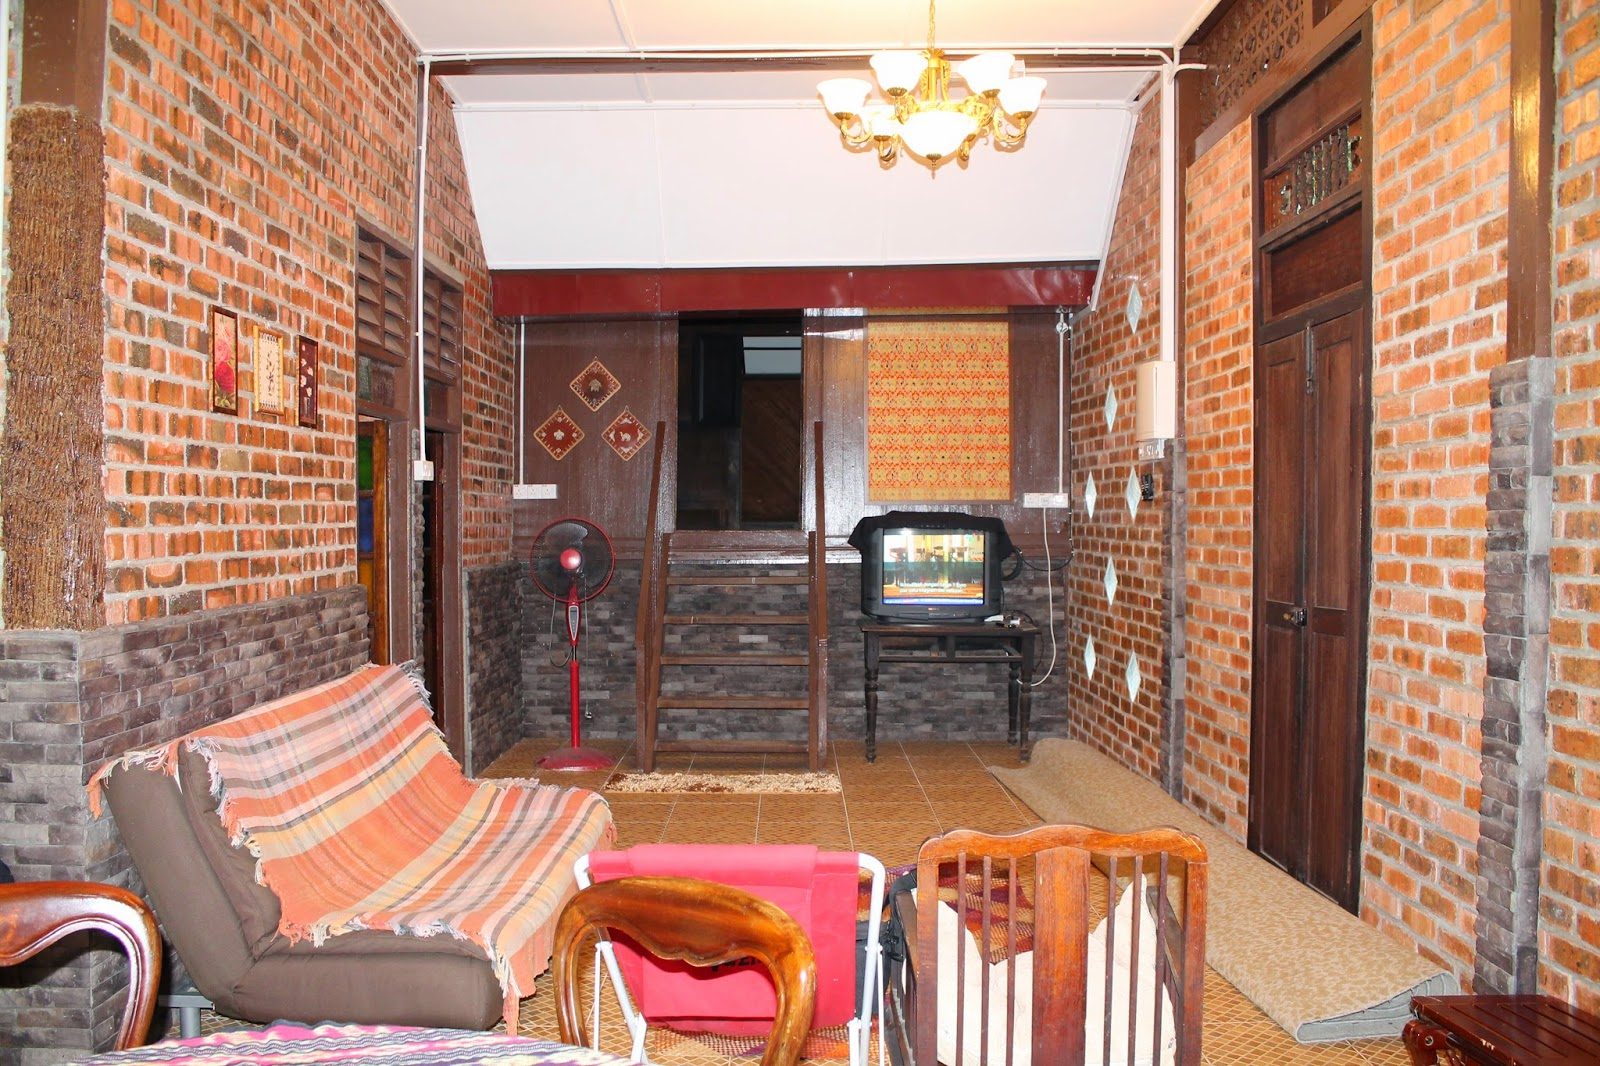 homestay rumah liza ruang tv dan sofa bed